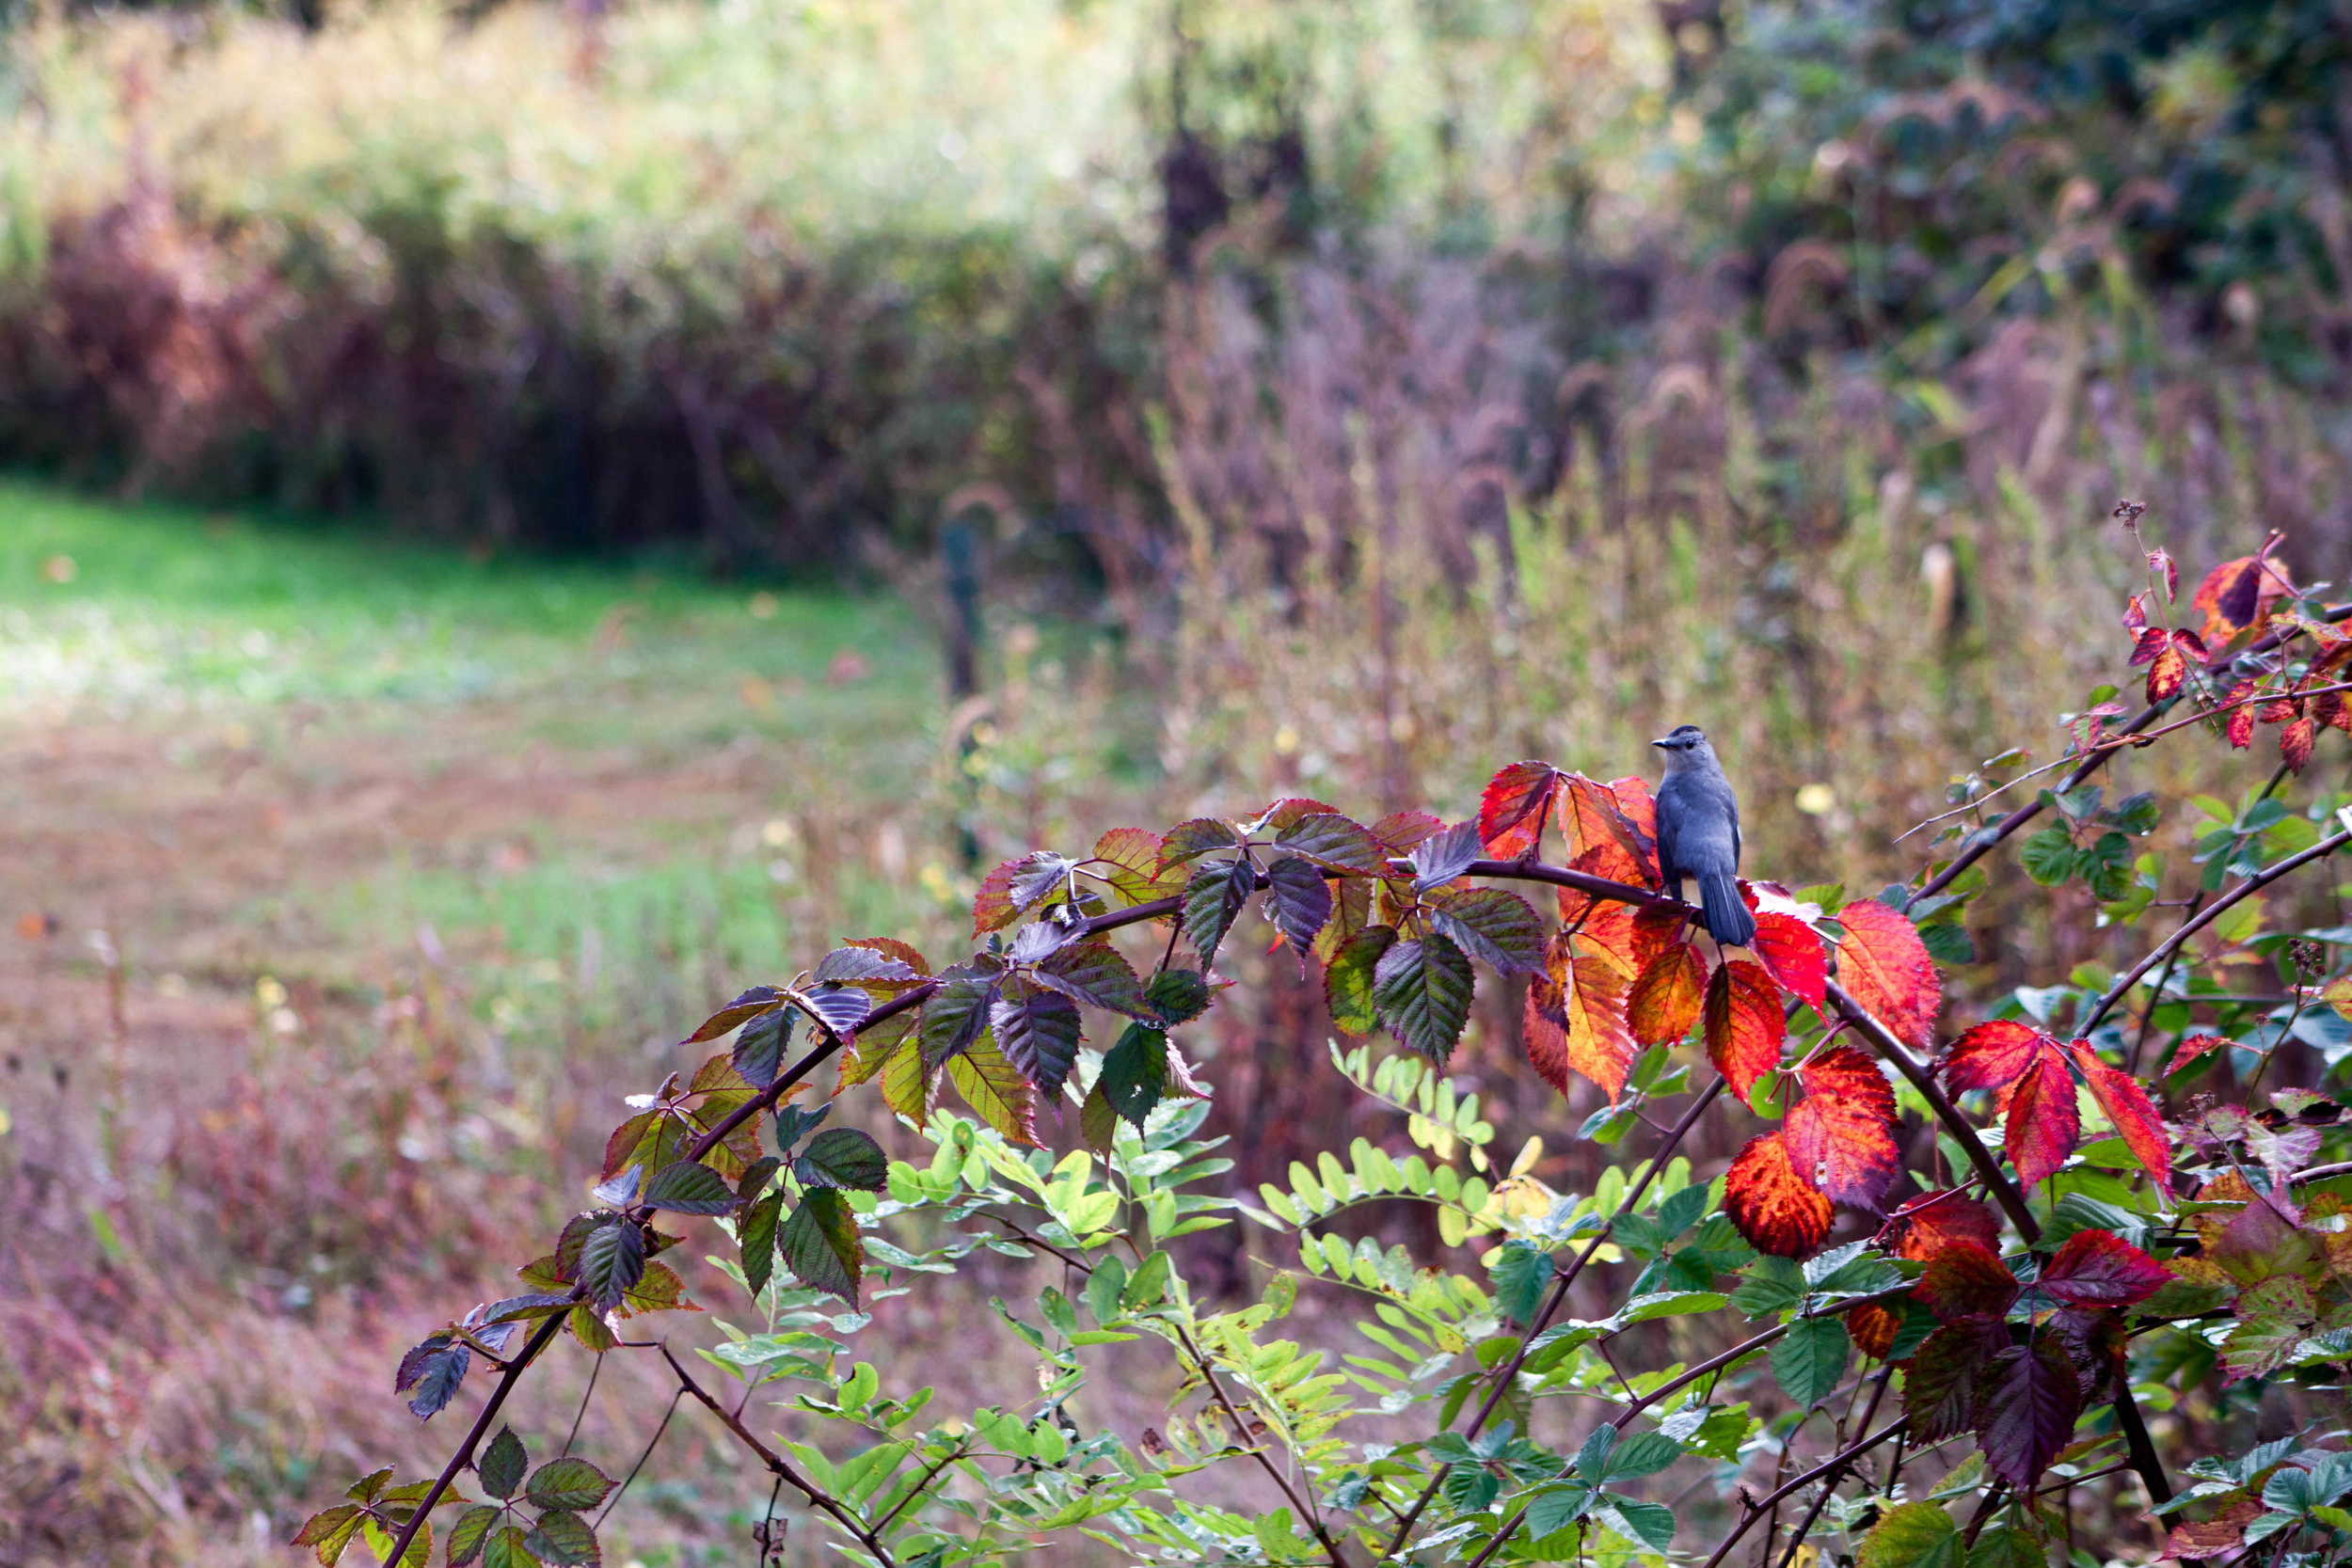 A bird perches on a branch in our backyard in Bradford, Rhode Island, 2013 or 2014.